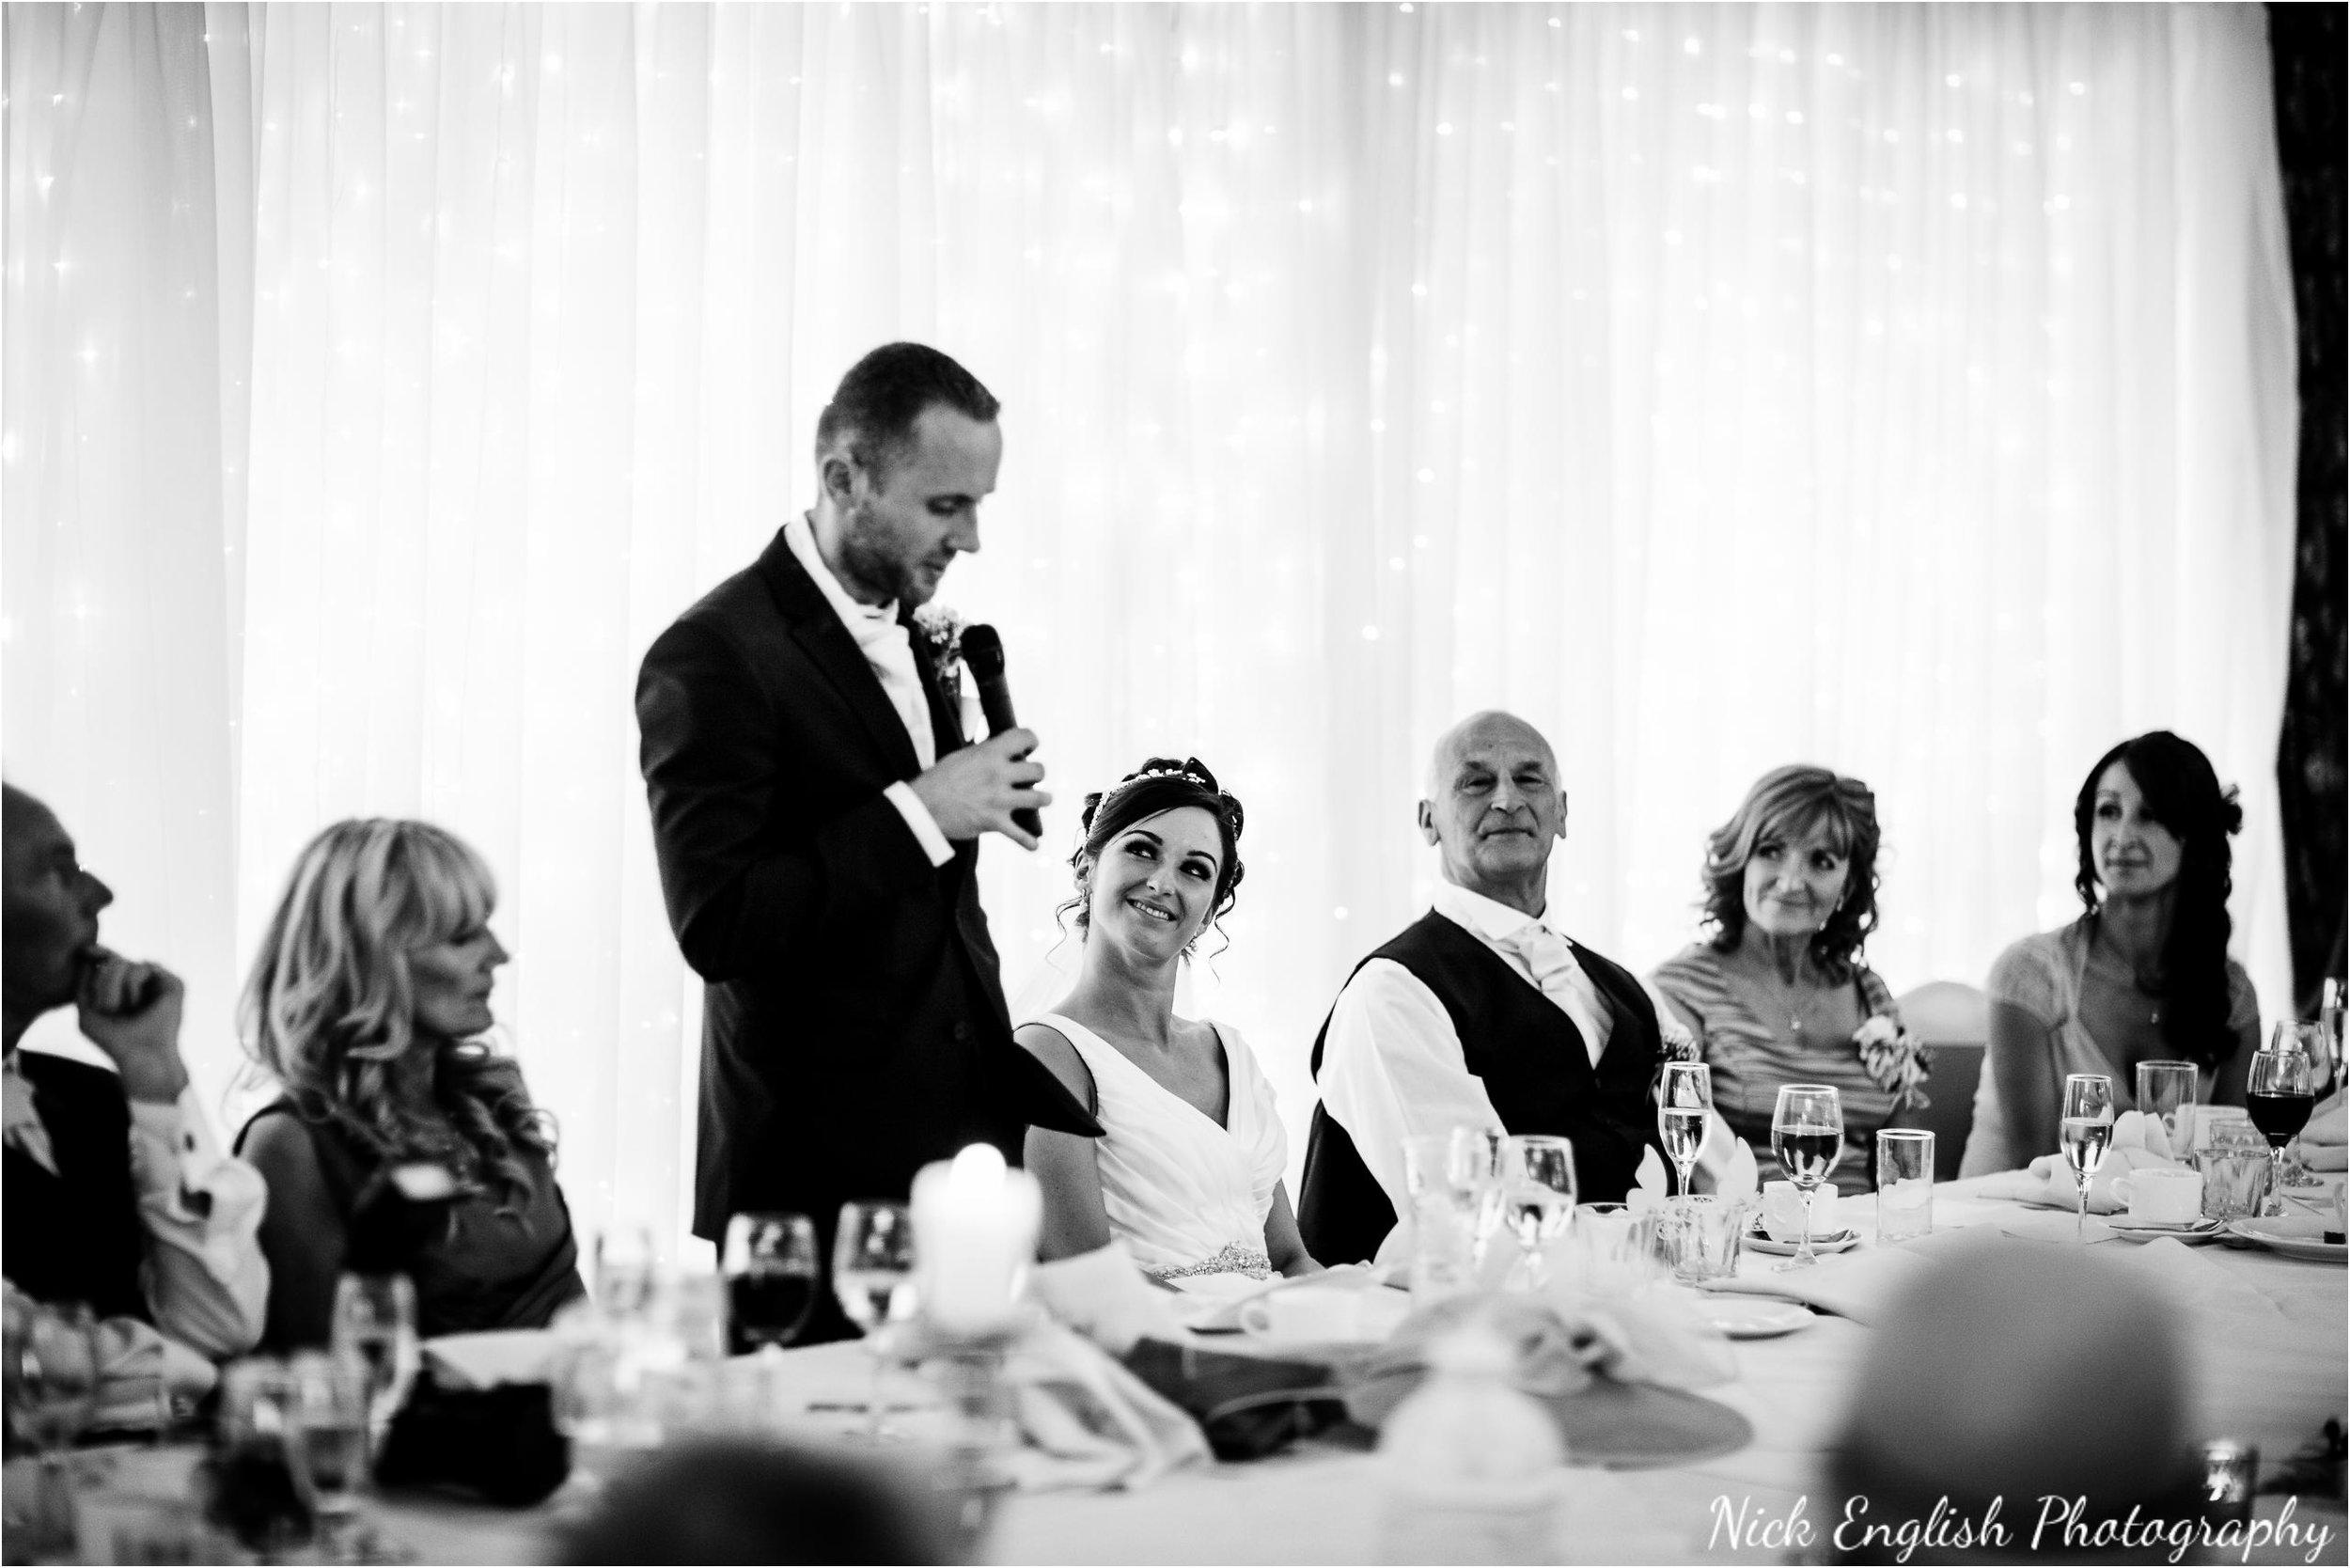 Emily David Wedding Photographs at Barton Grange Preston by Nick English Photography 172jpg.jpeg